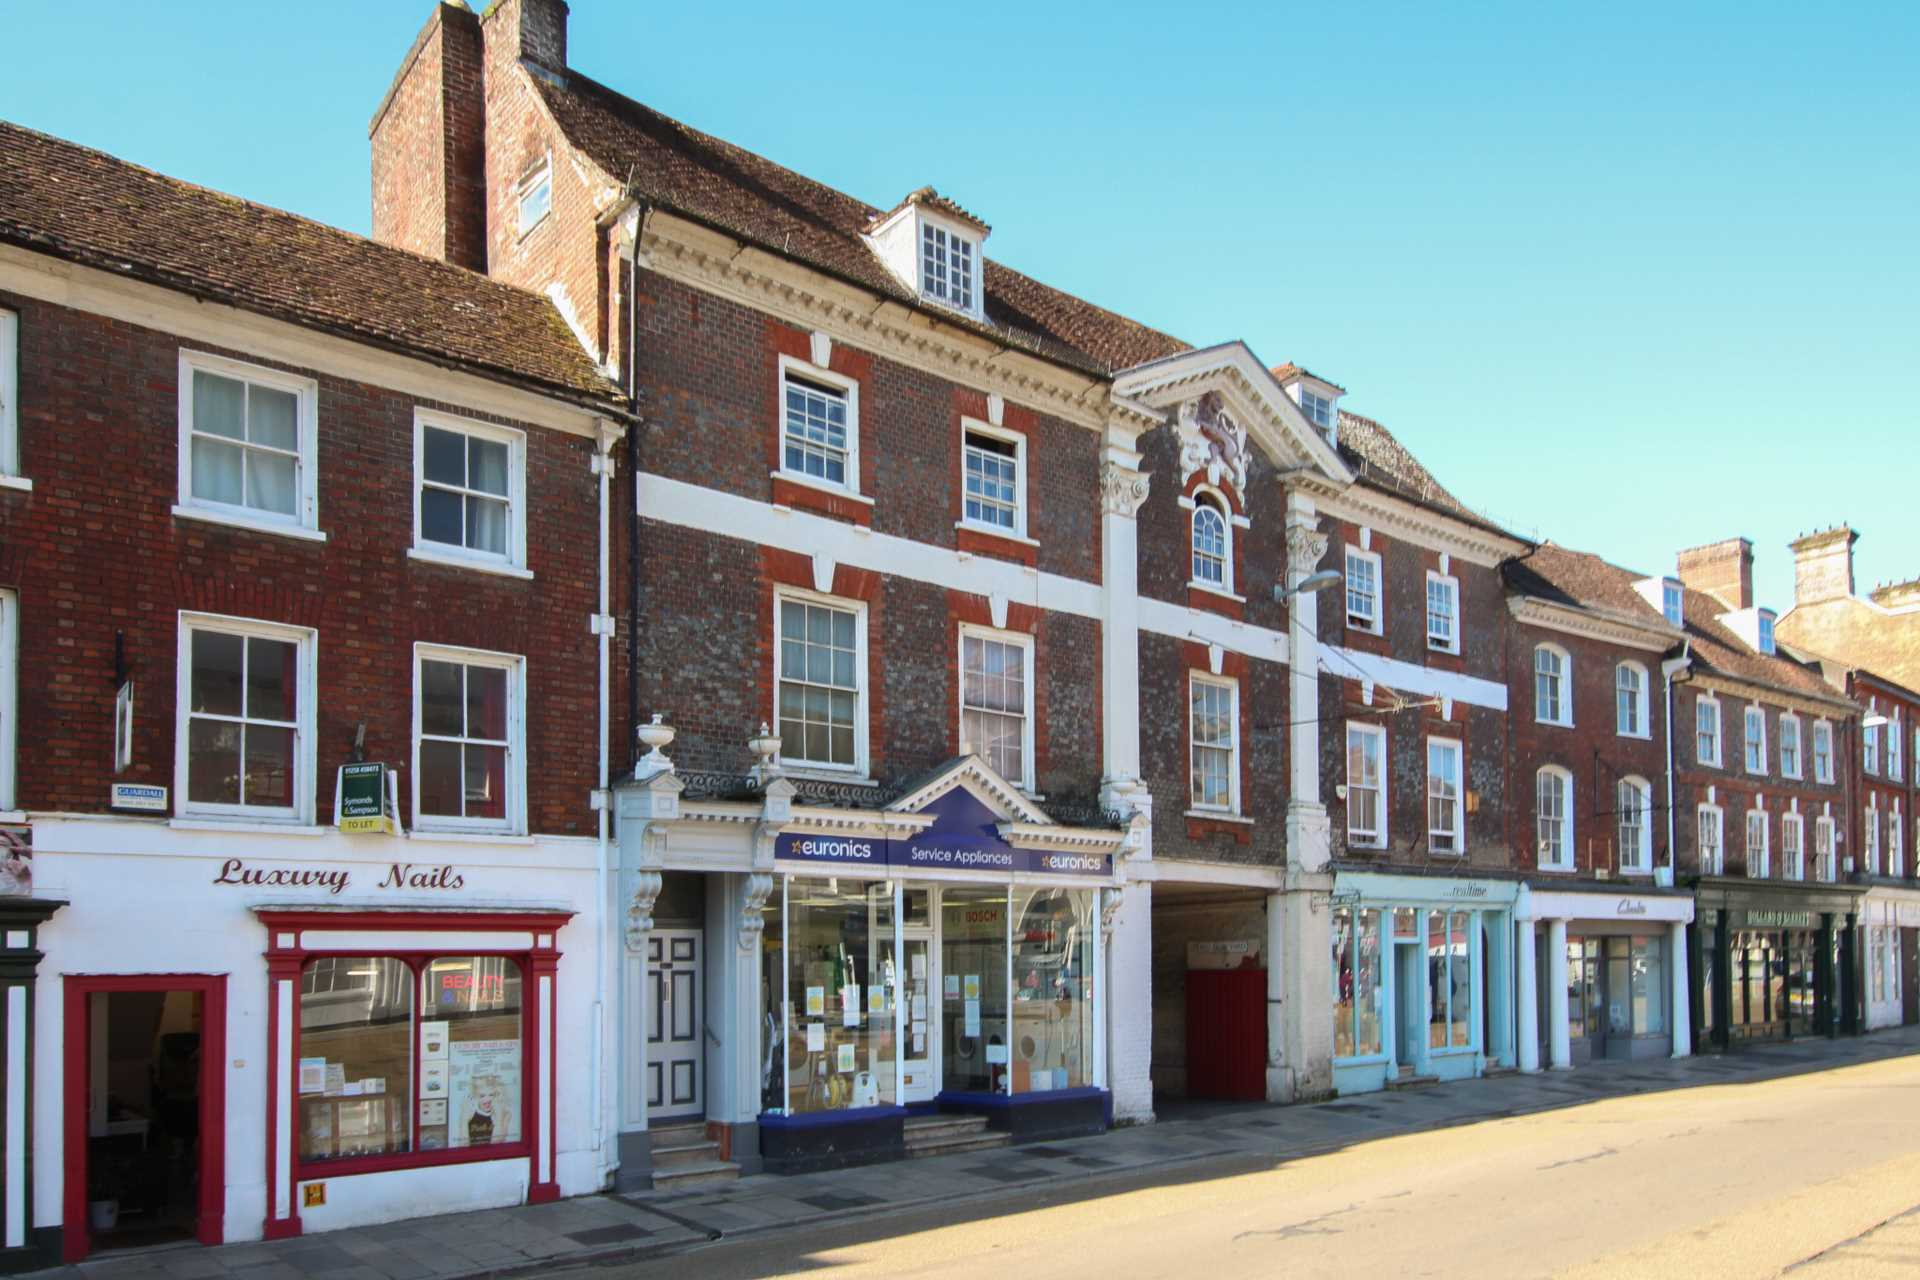 1 bed flat for sale in Market Place, Blandford Forum, Blandford Forum  - Property Image 1